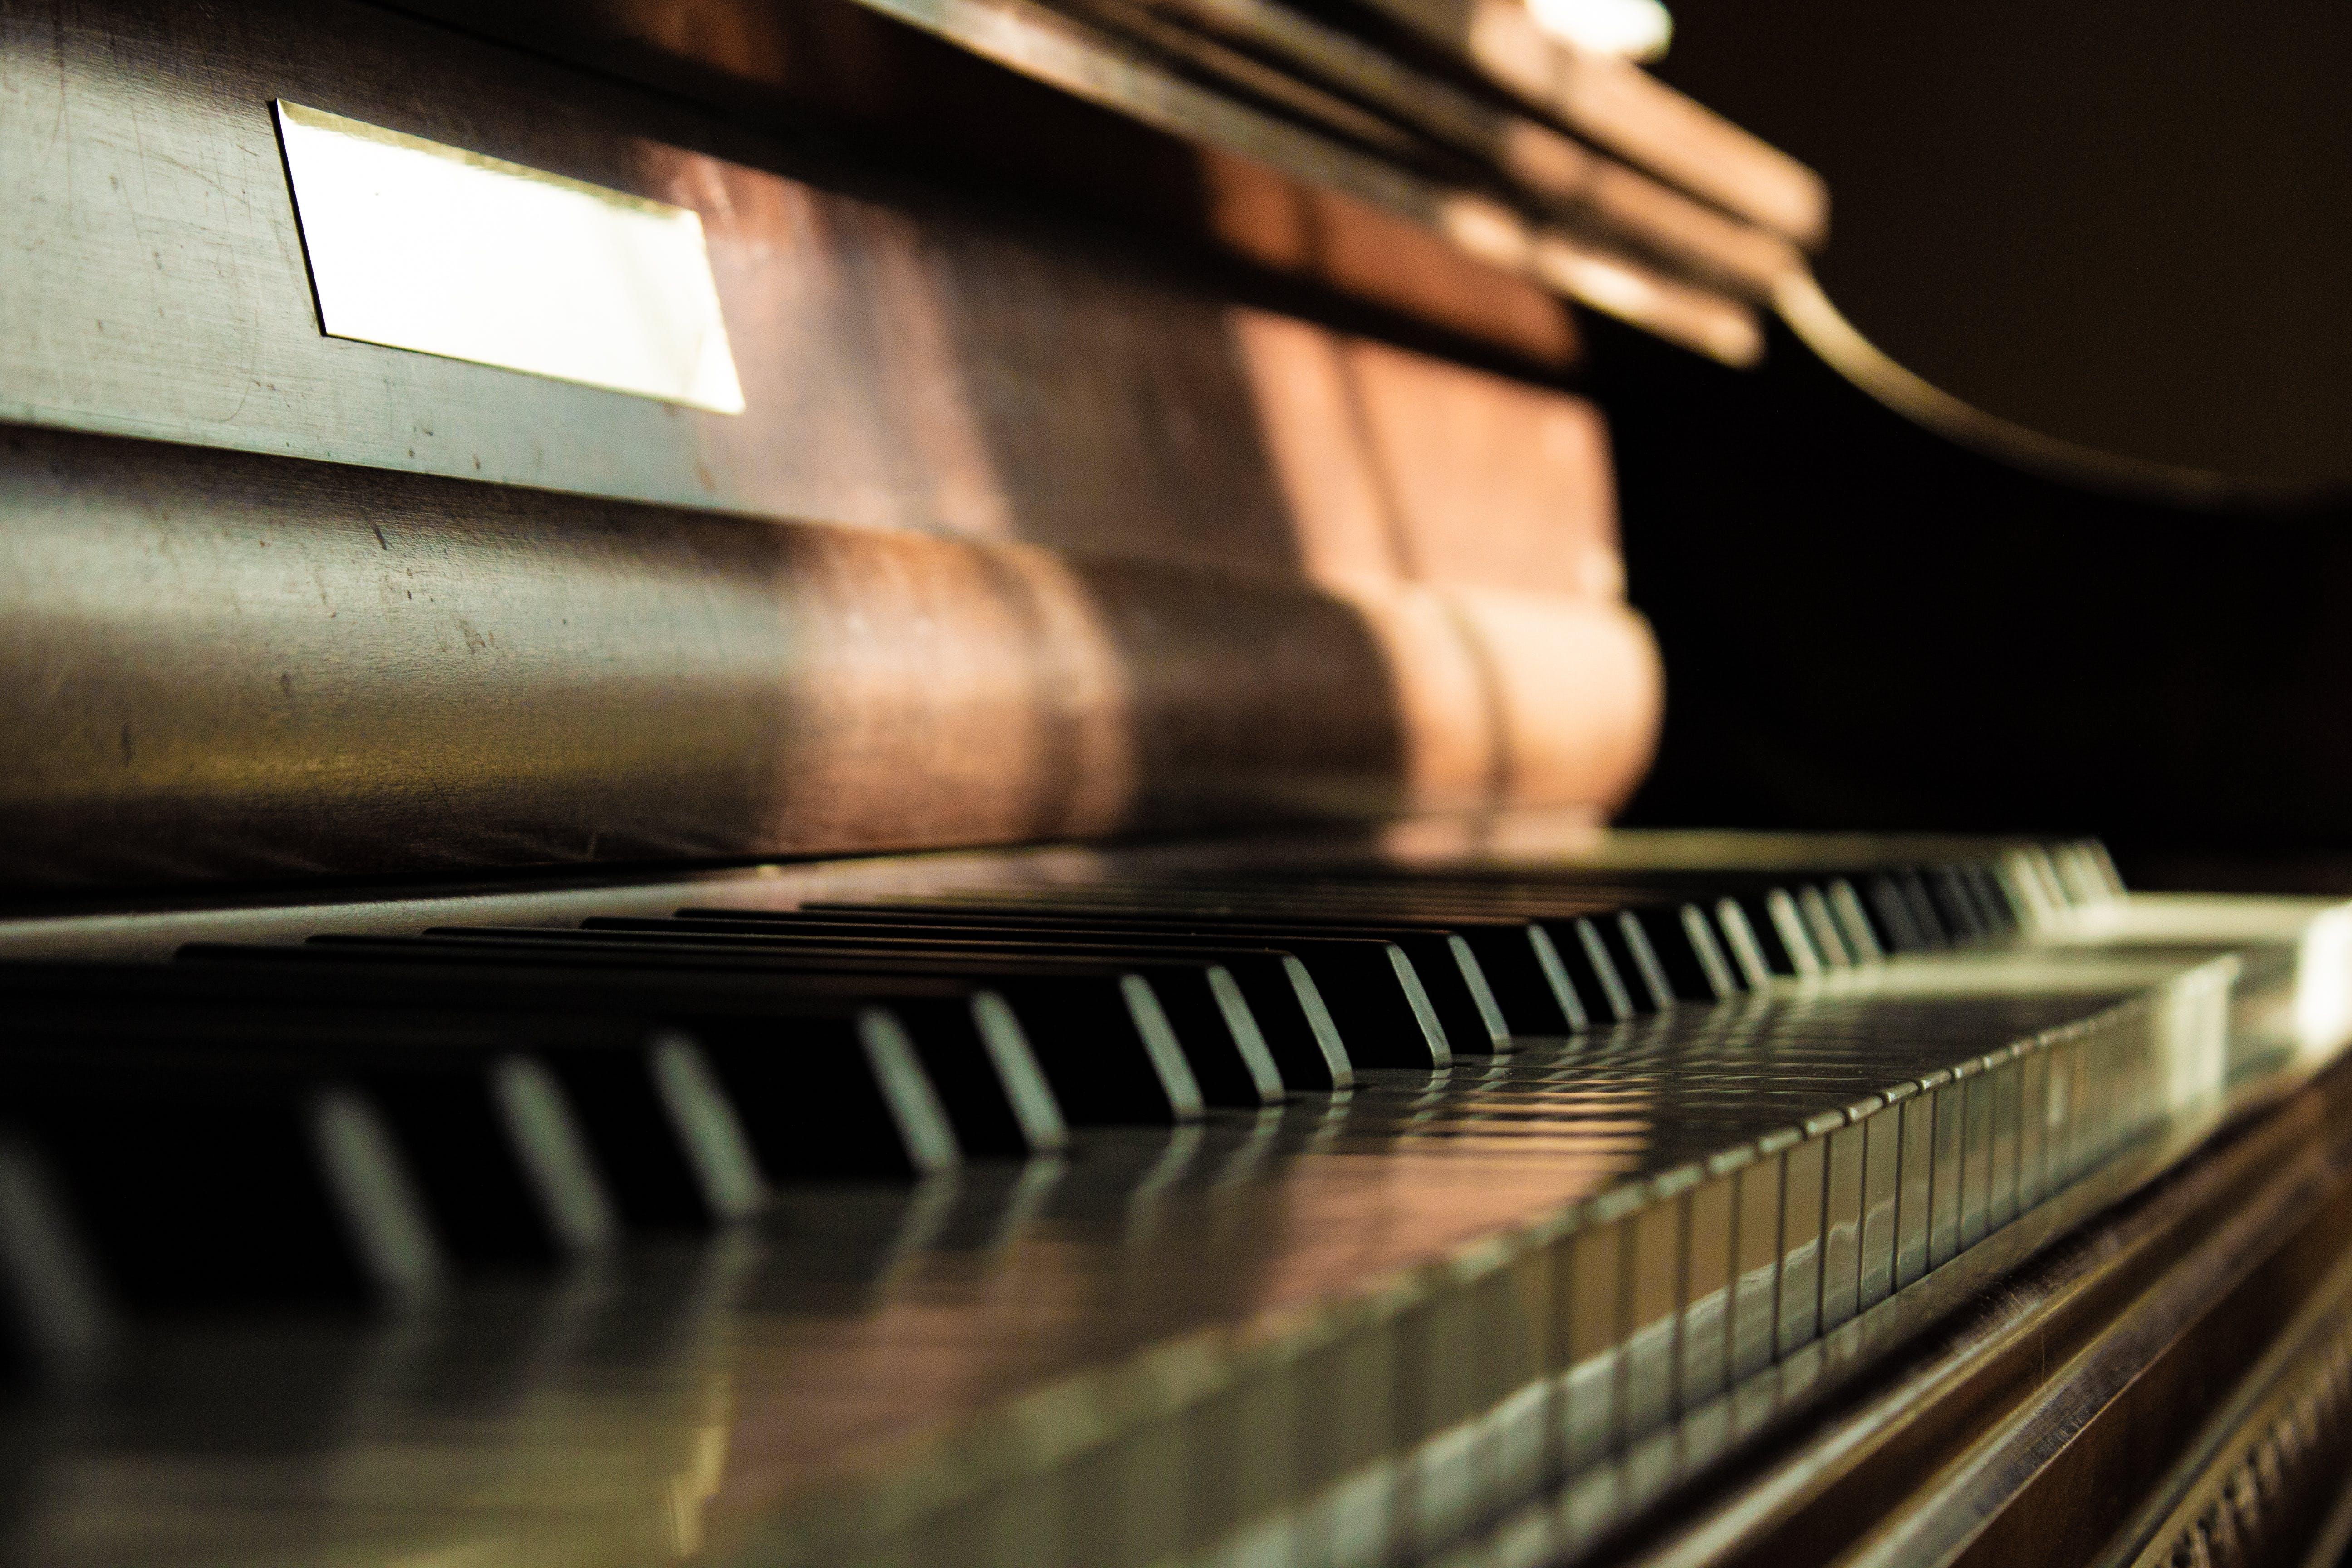 Základová fotografie zdarma na téma hudba, klávesy piana, klavír, nástroje